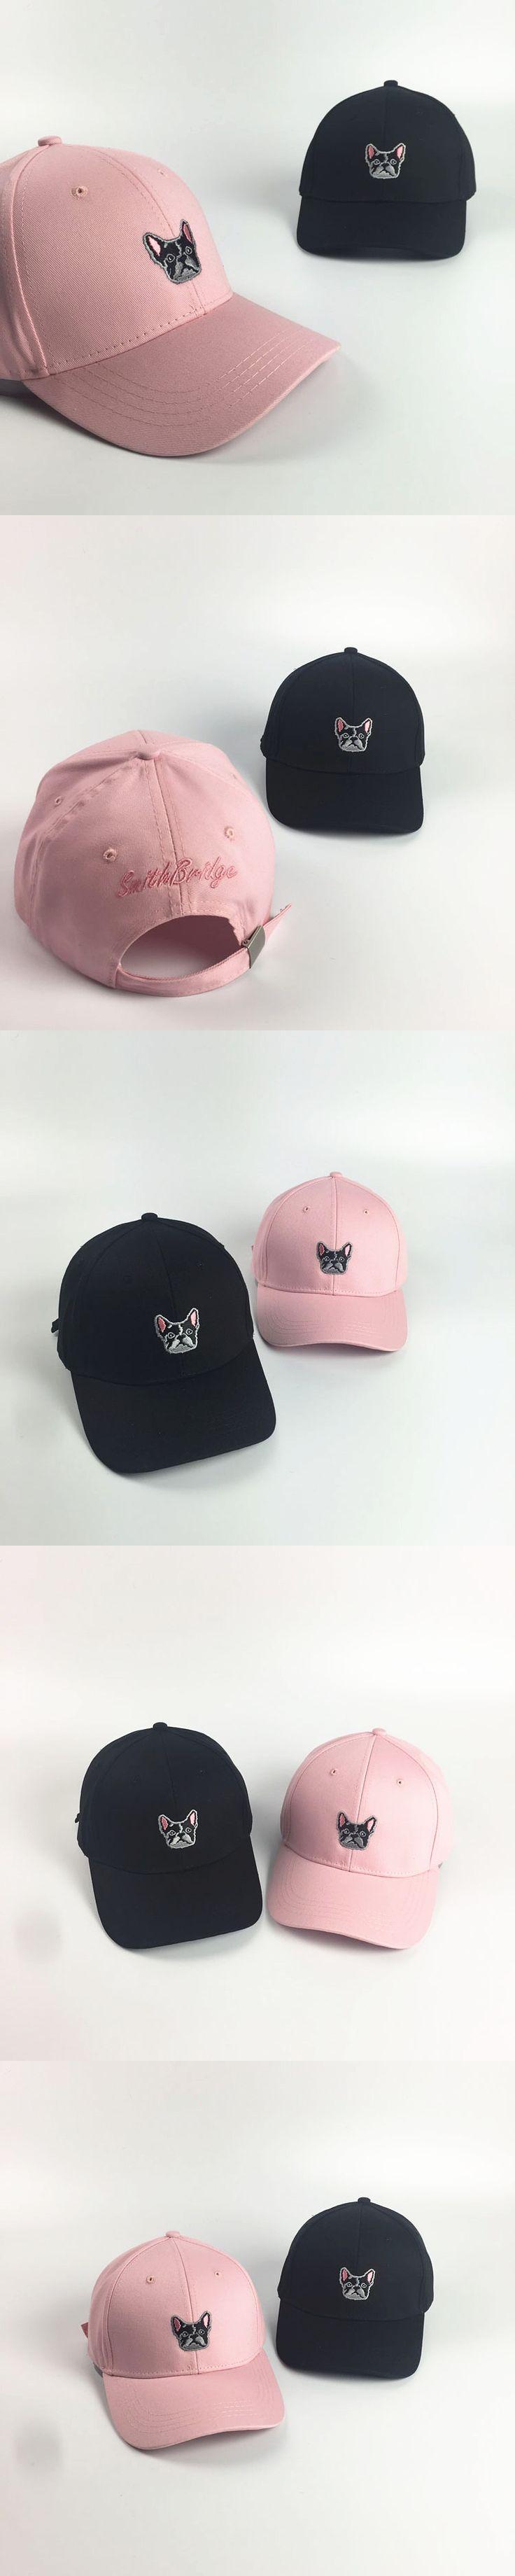 2016 New Arrival Gorras Korea Ulzzang Harajuku Cute Puppy Snapback Hats Embroidery Baseball Cap For Men And Women Peaked Caps